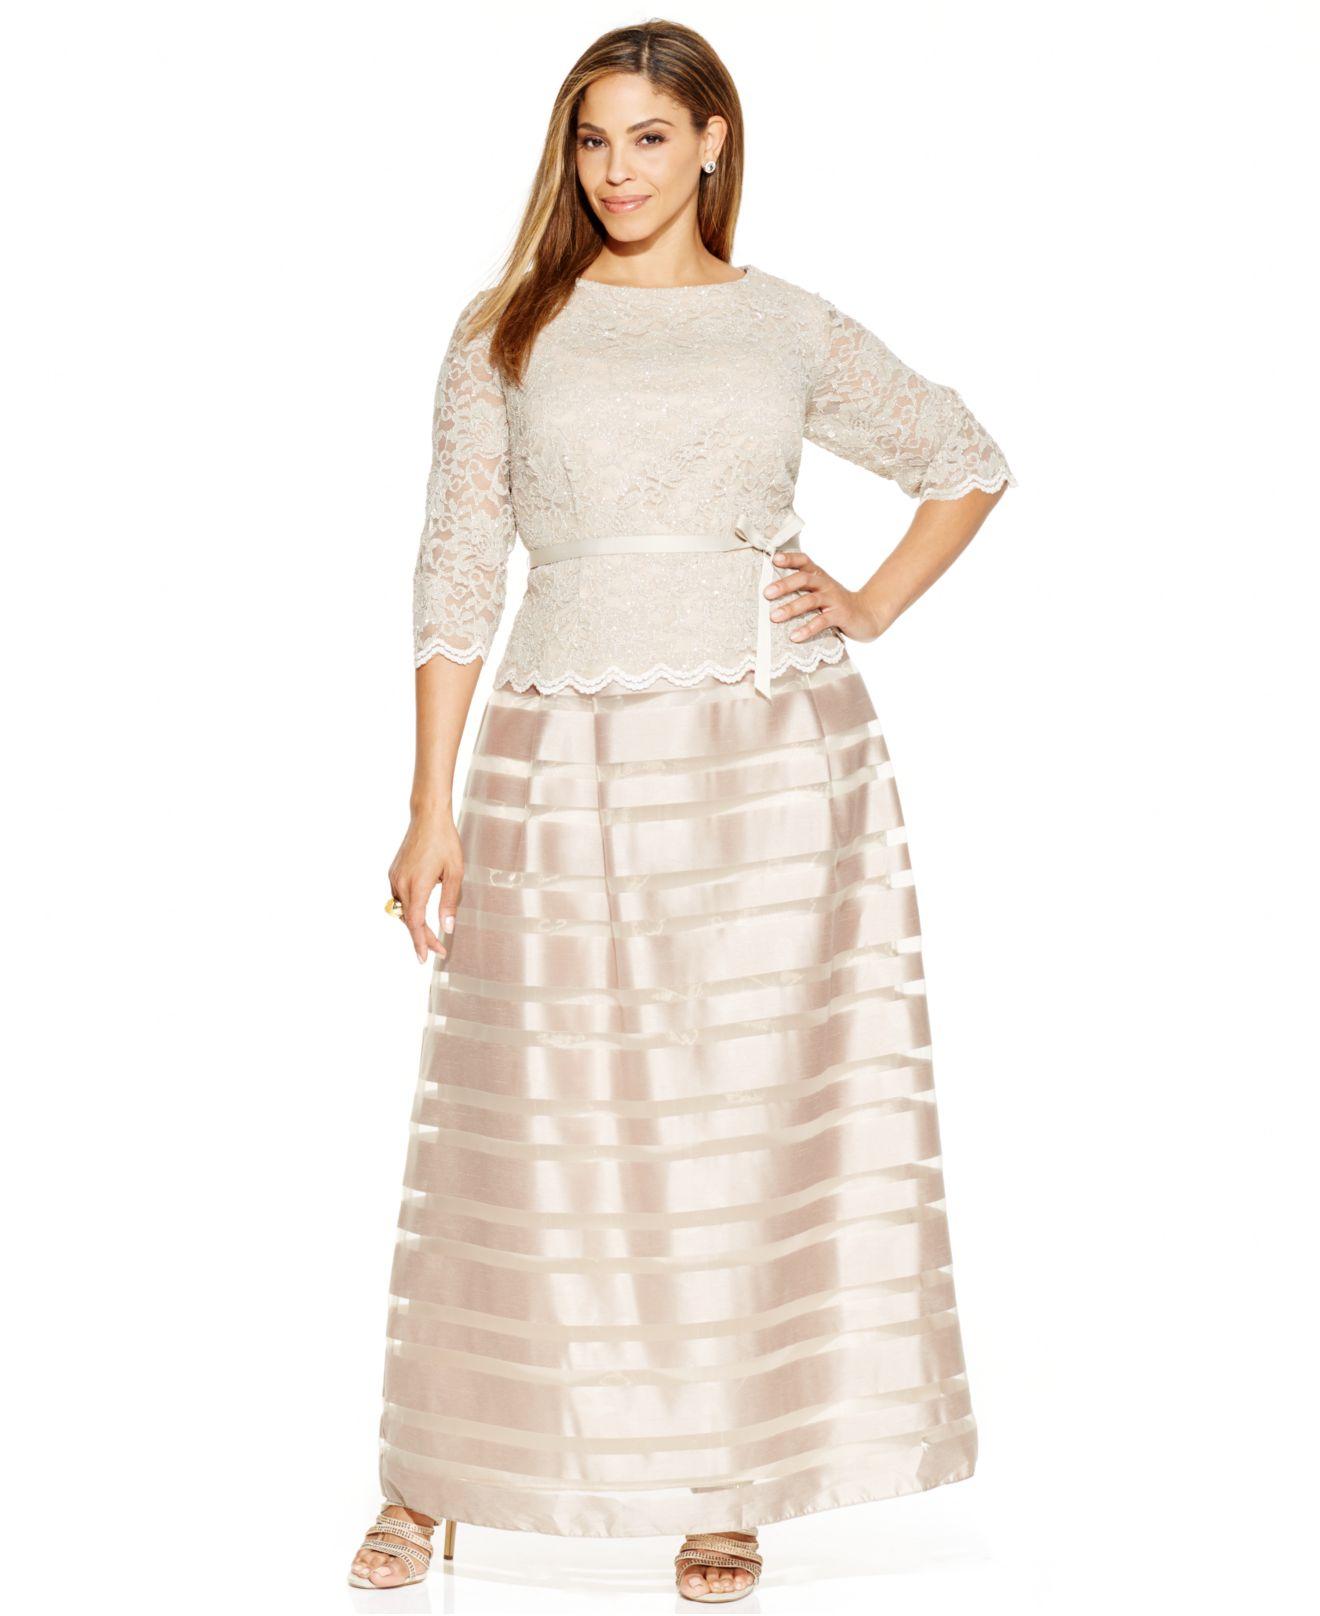 Champagne Chiffon Dresses Plus Size